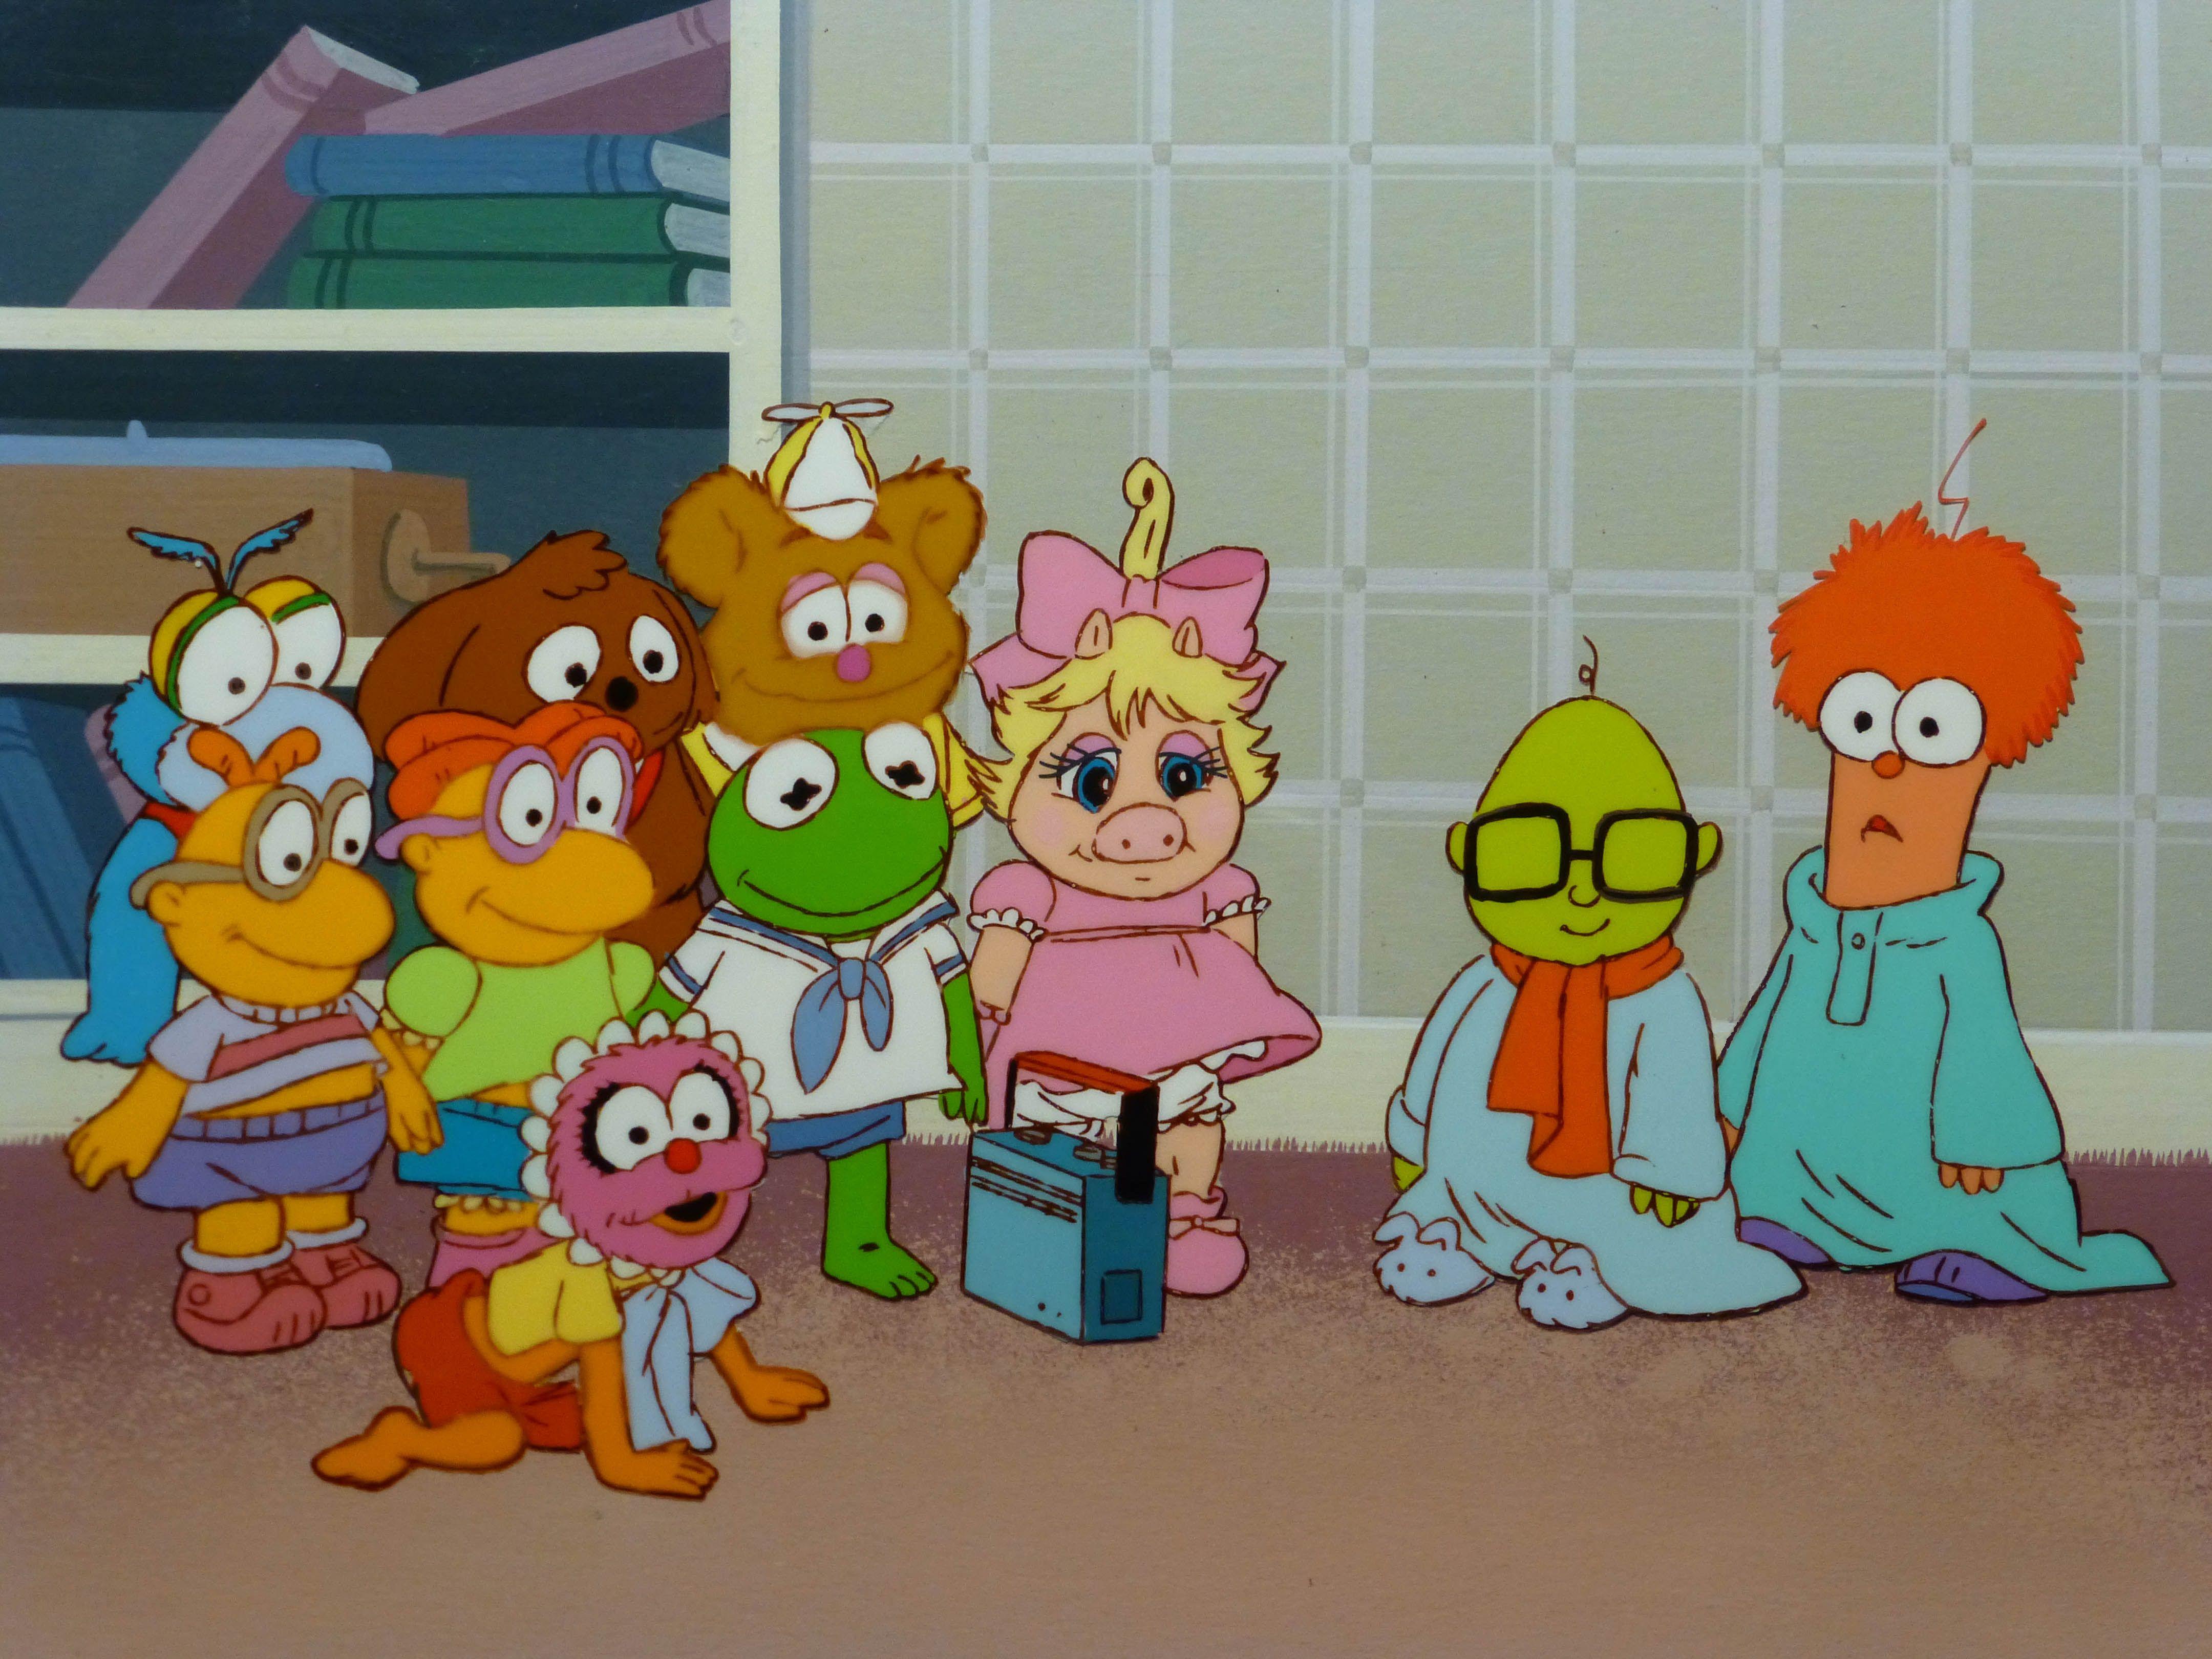 Rare Jim Henson S Muppet Babies Cel Setup From Musical Muppets Muppet Babies Muppets The Muppet Show